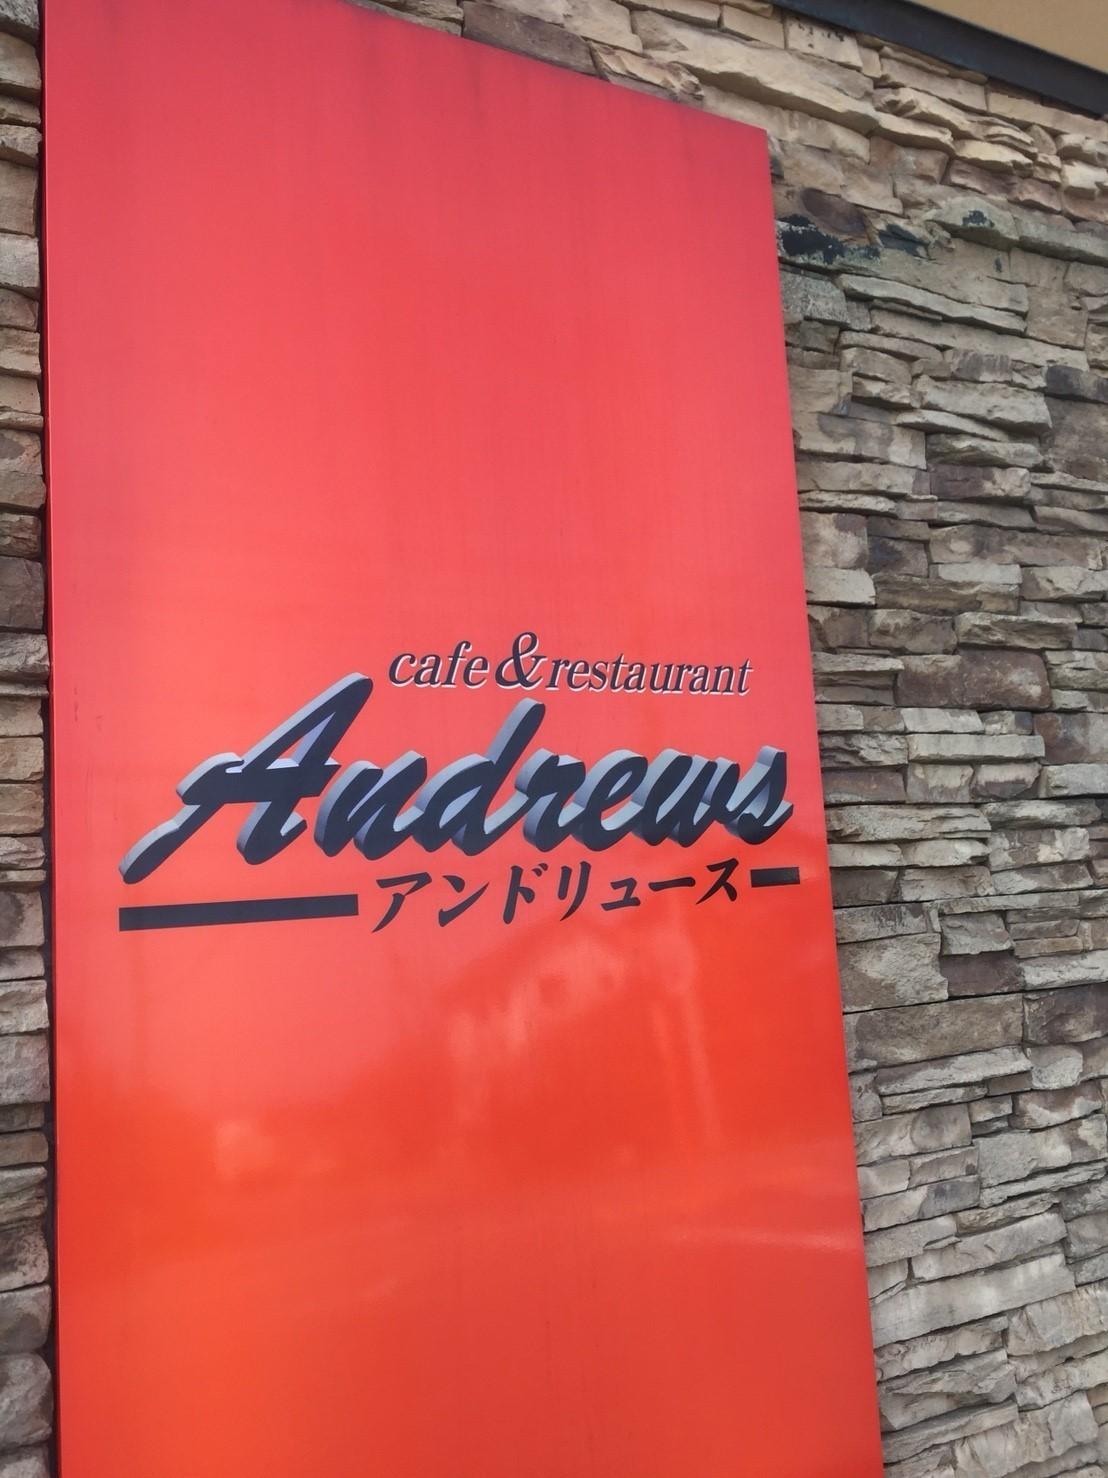 cafe & restaurant  アンドリュース  ポークチーズカツレツ_e0115904_14282167.jpg